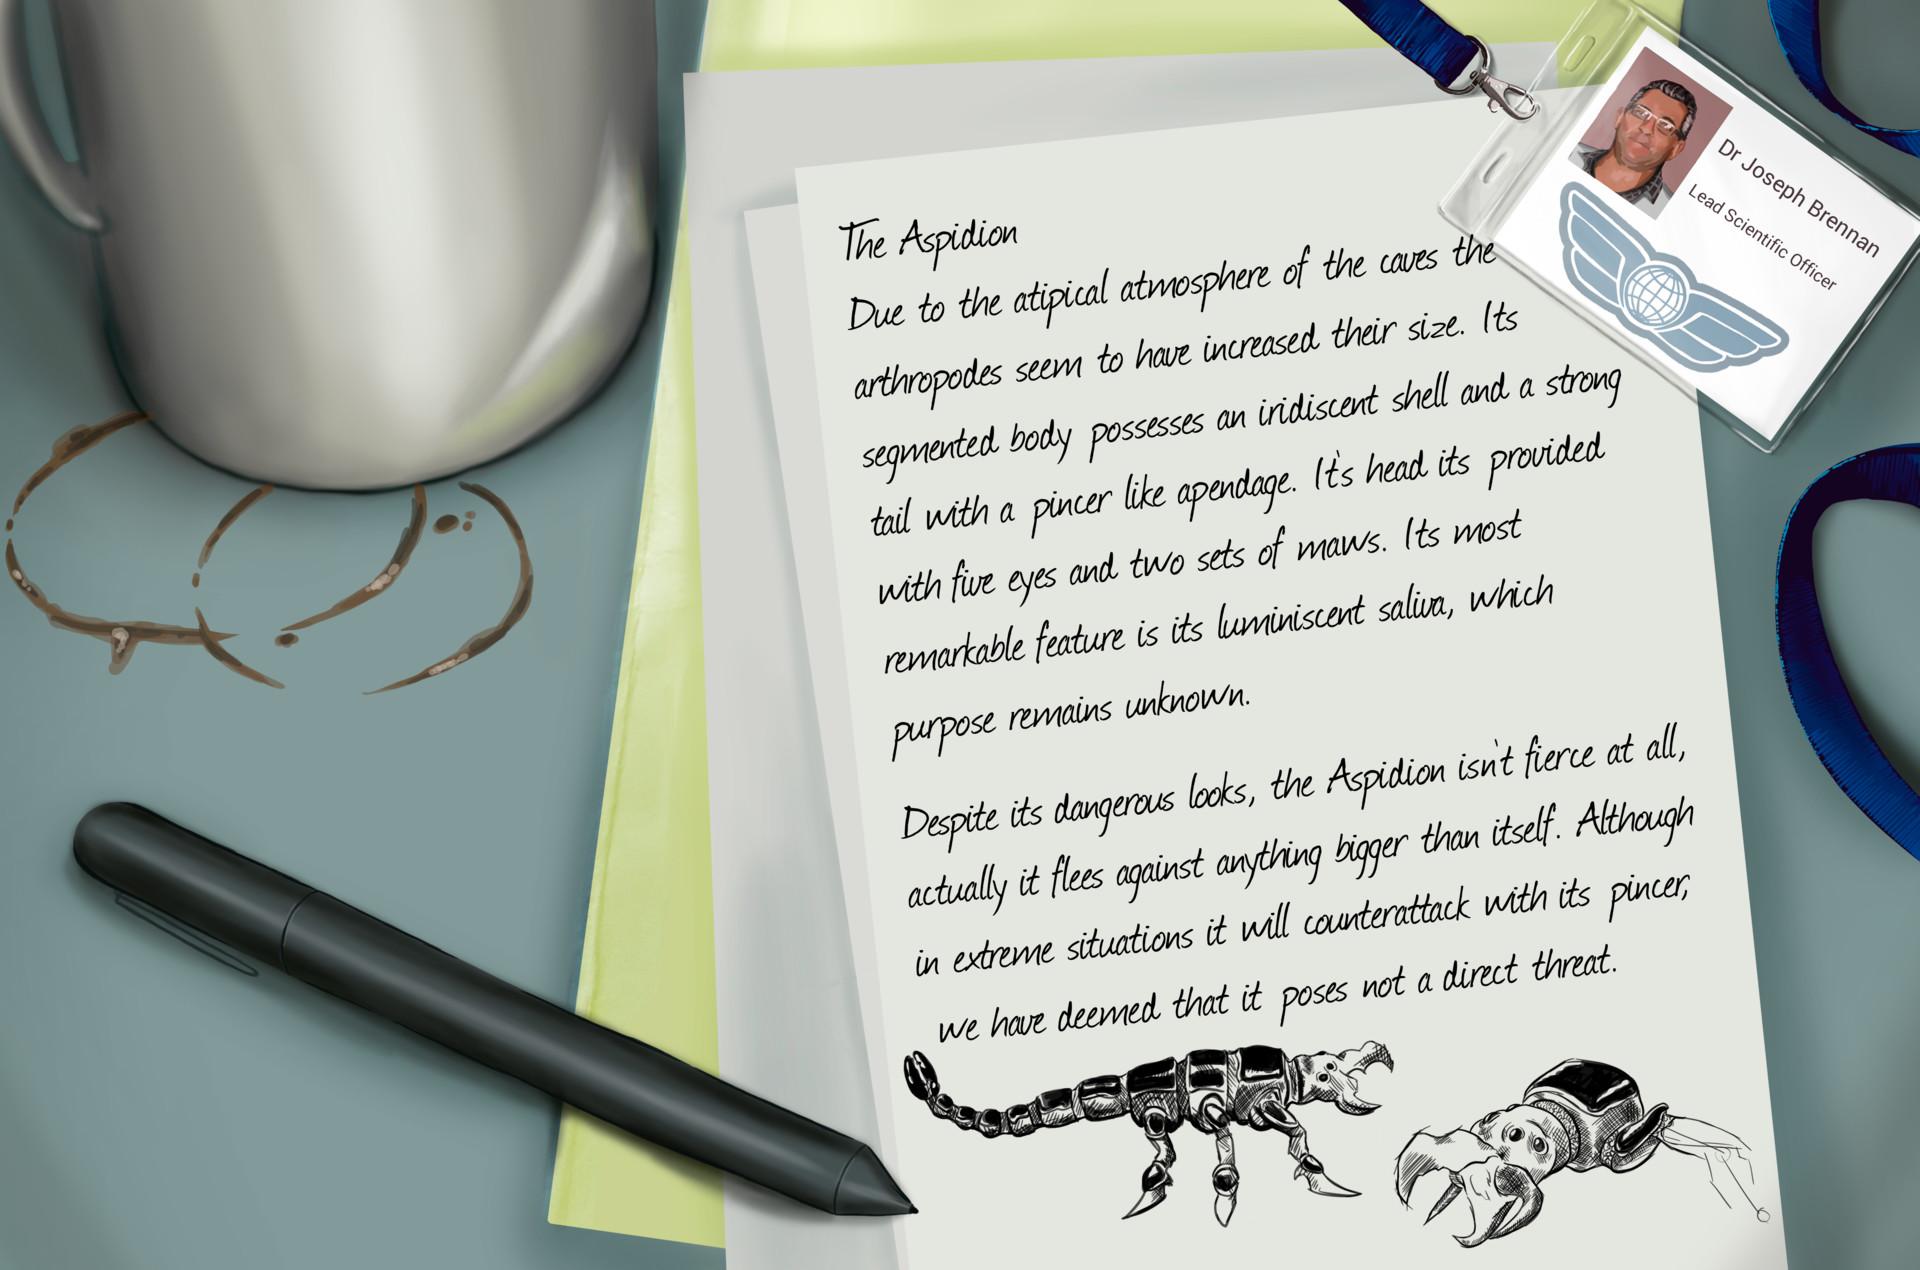 Saida granero parra brennan nota aspidion